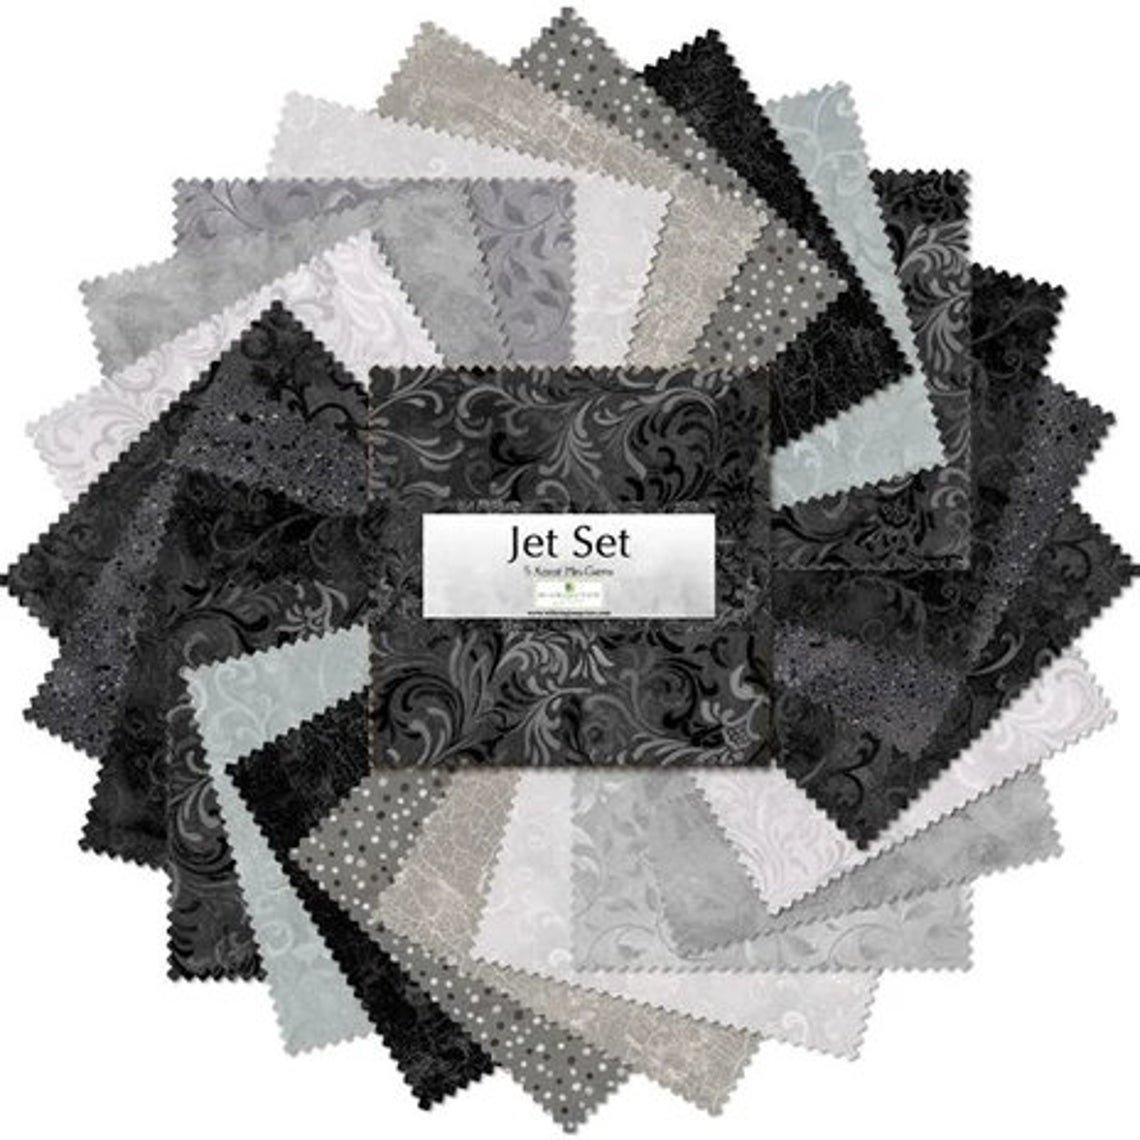 Charm Squares - Jet Set Essentials by Wilmington